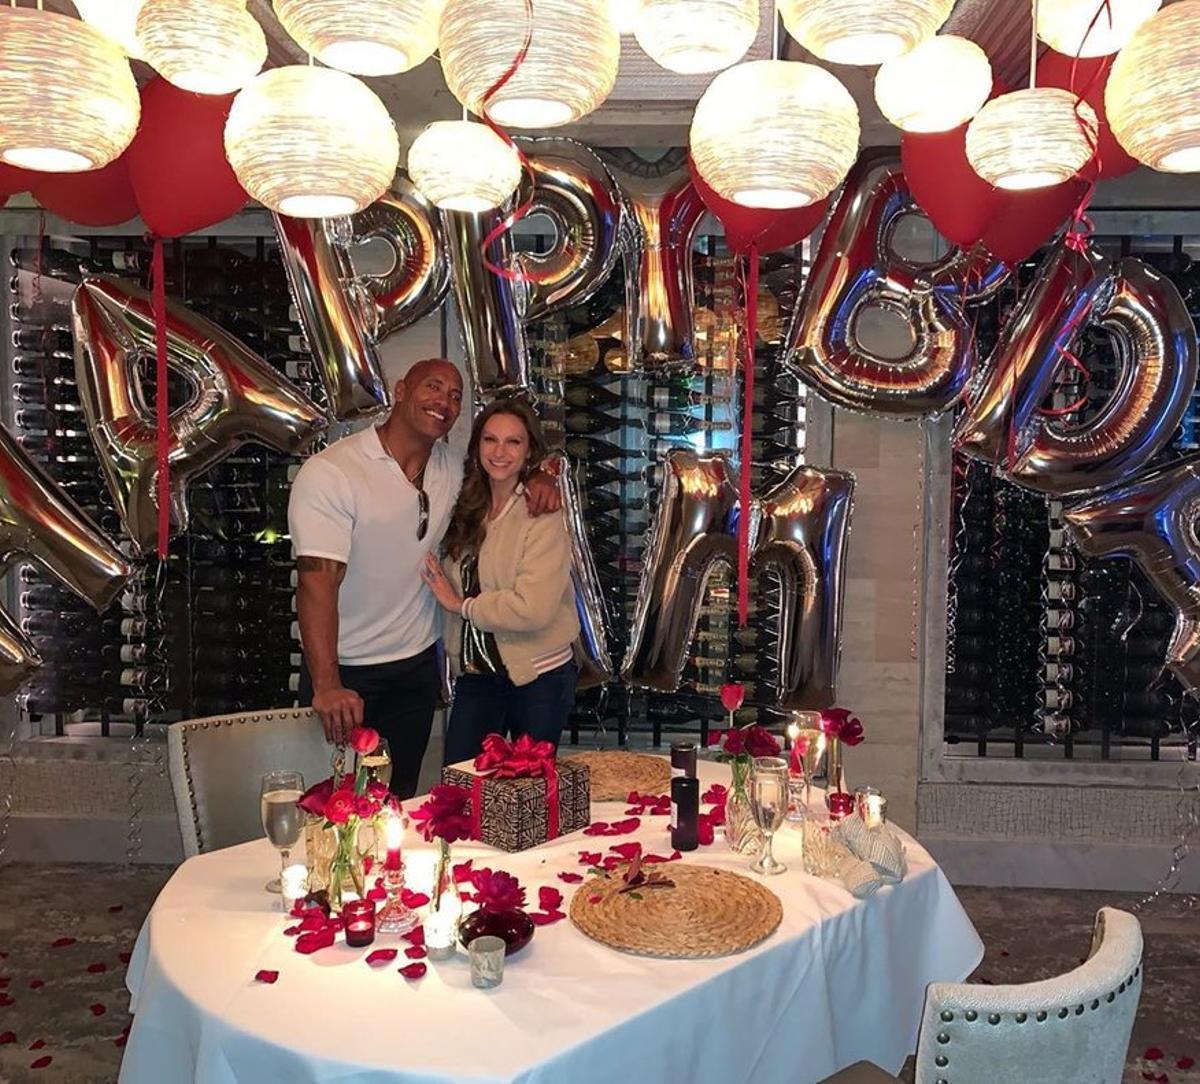 Dawney 'La Roca' Johnson, con su mujer, Lauren Hashian.